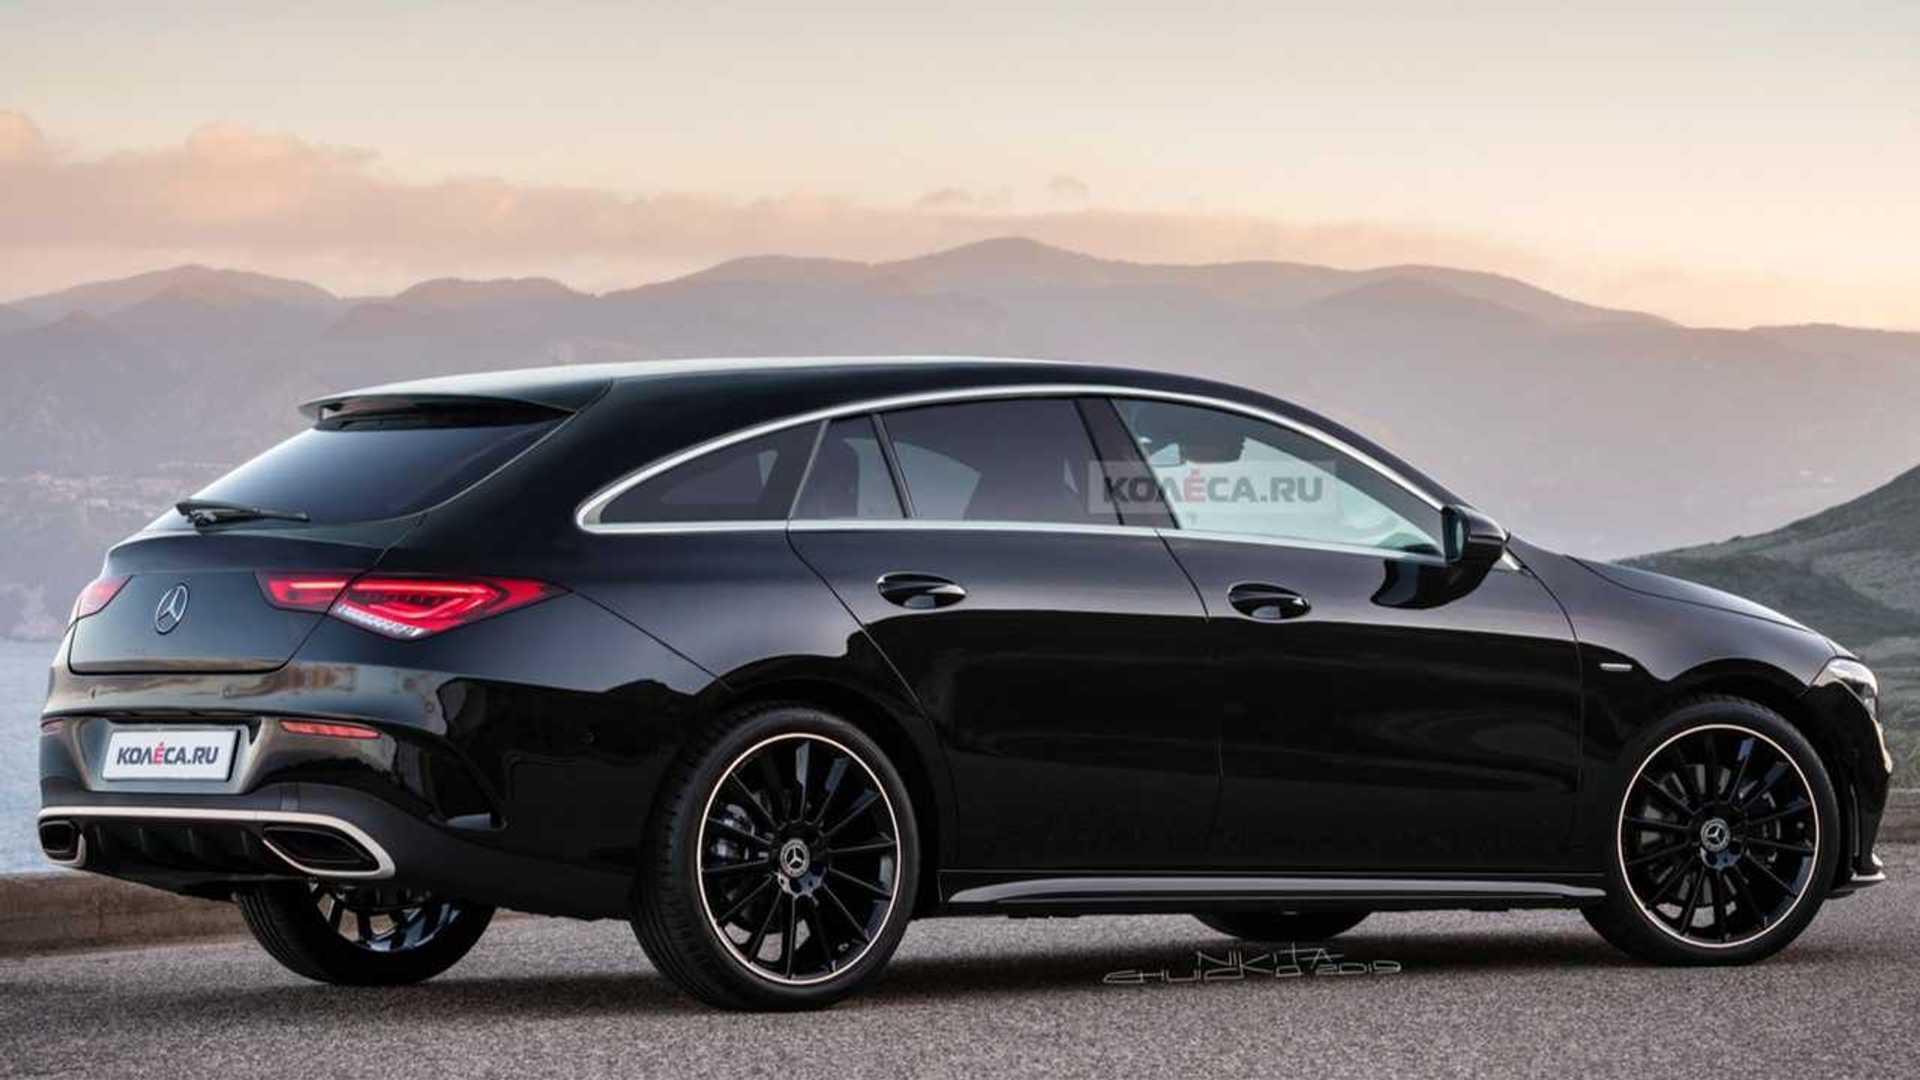 2020 Mercedes Cla Shooting Brake Rendered As Stylish Wagon